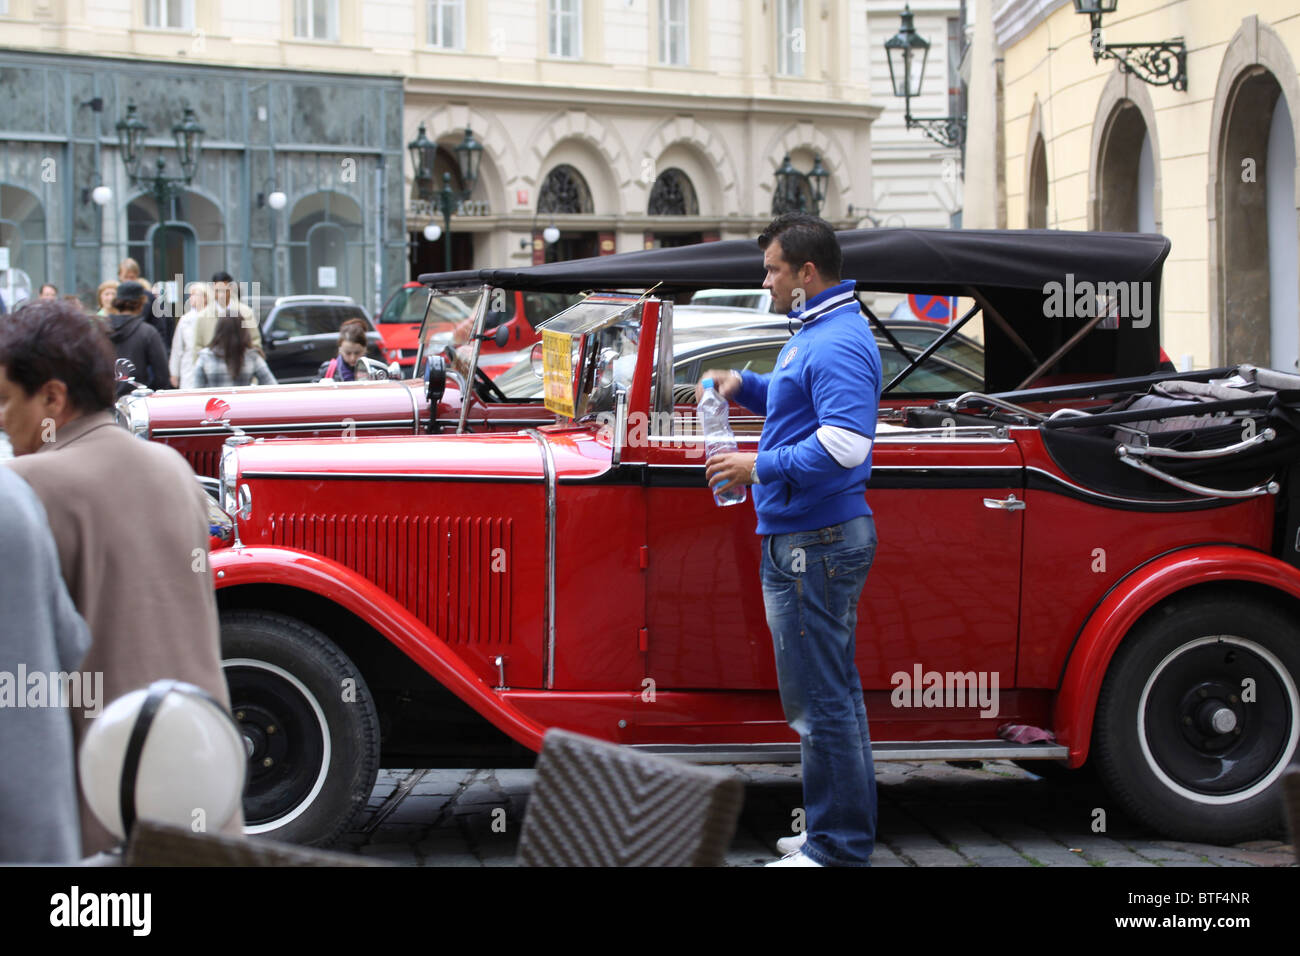 Chauffeur driven vintage cars for hire Old Town Square Prague Praha ...